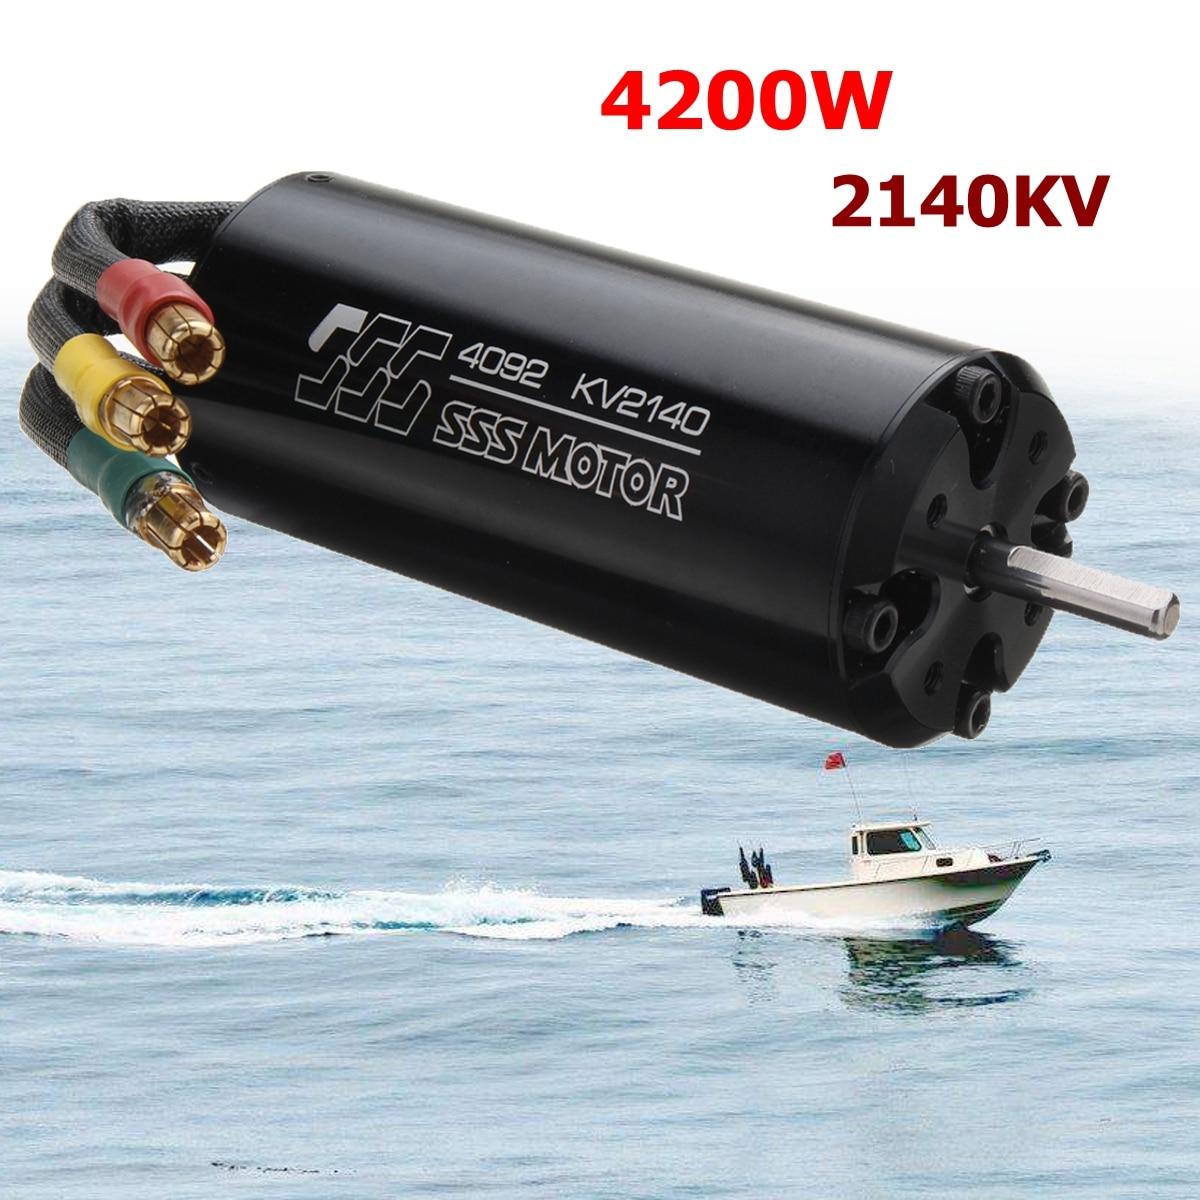 SSS 4092/2140KV Brushless Motor 4 Poles W/O Water Cooling For RC Boats sss 2960 1810kv 2400kv 2880kv 4122kv brushless motor w o water cooling for electric rc boat